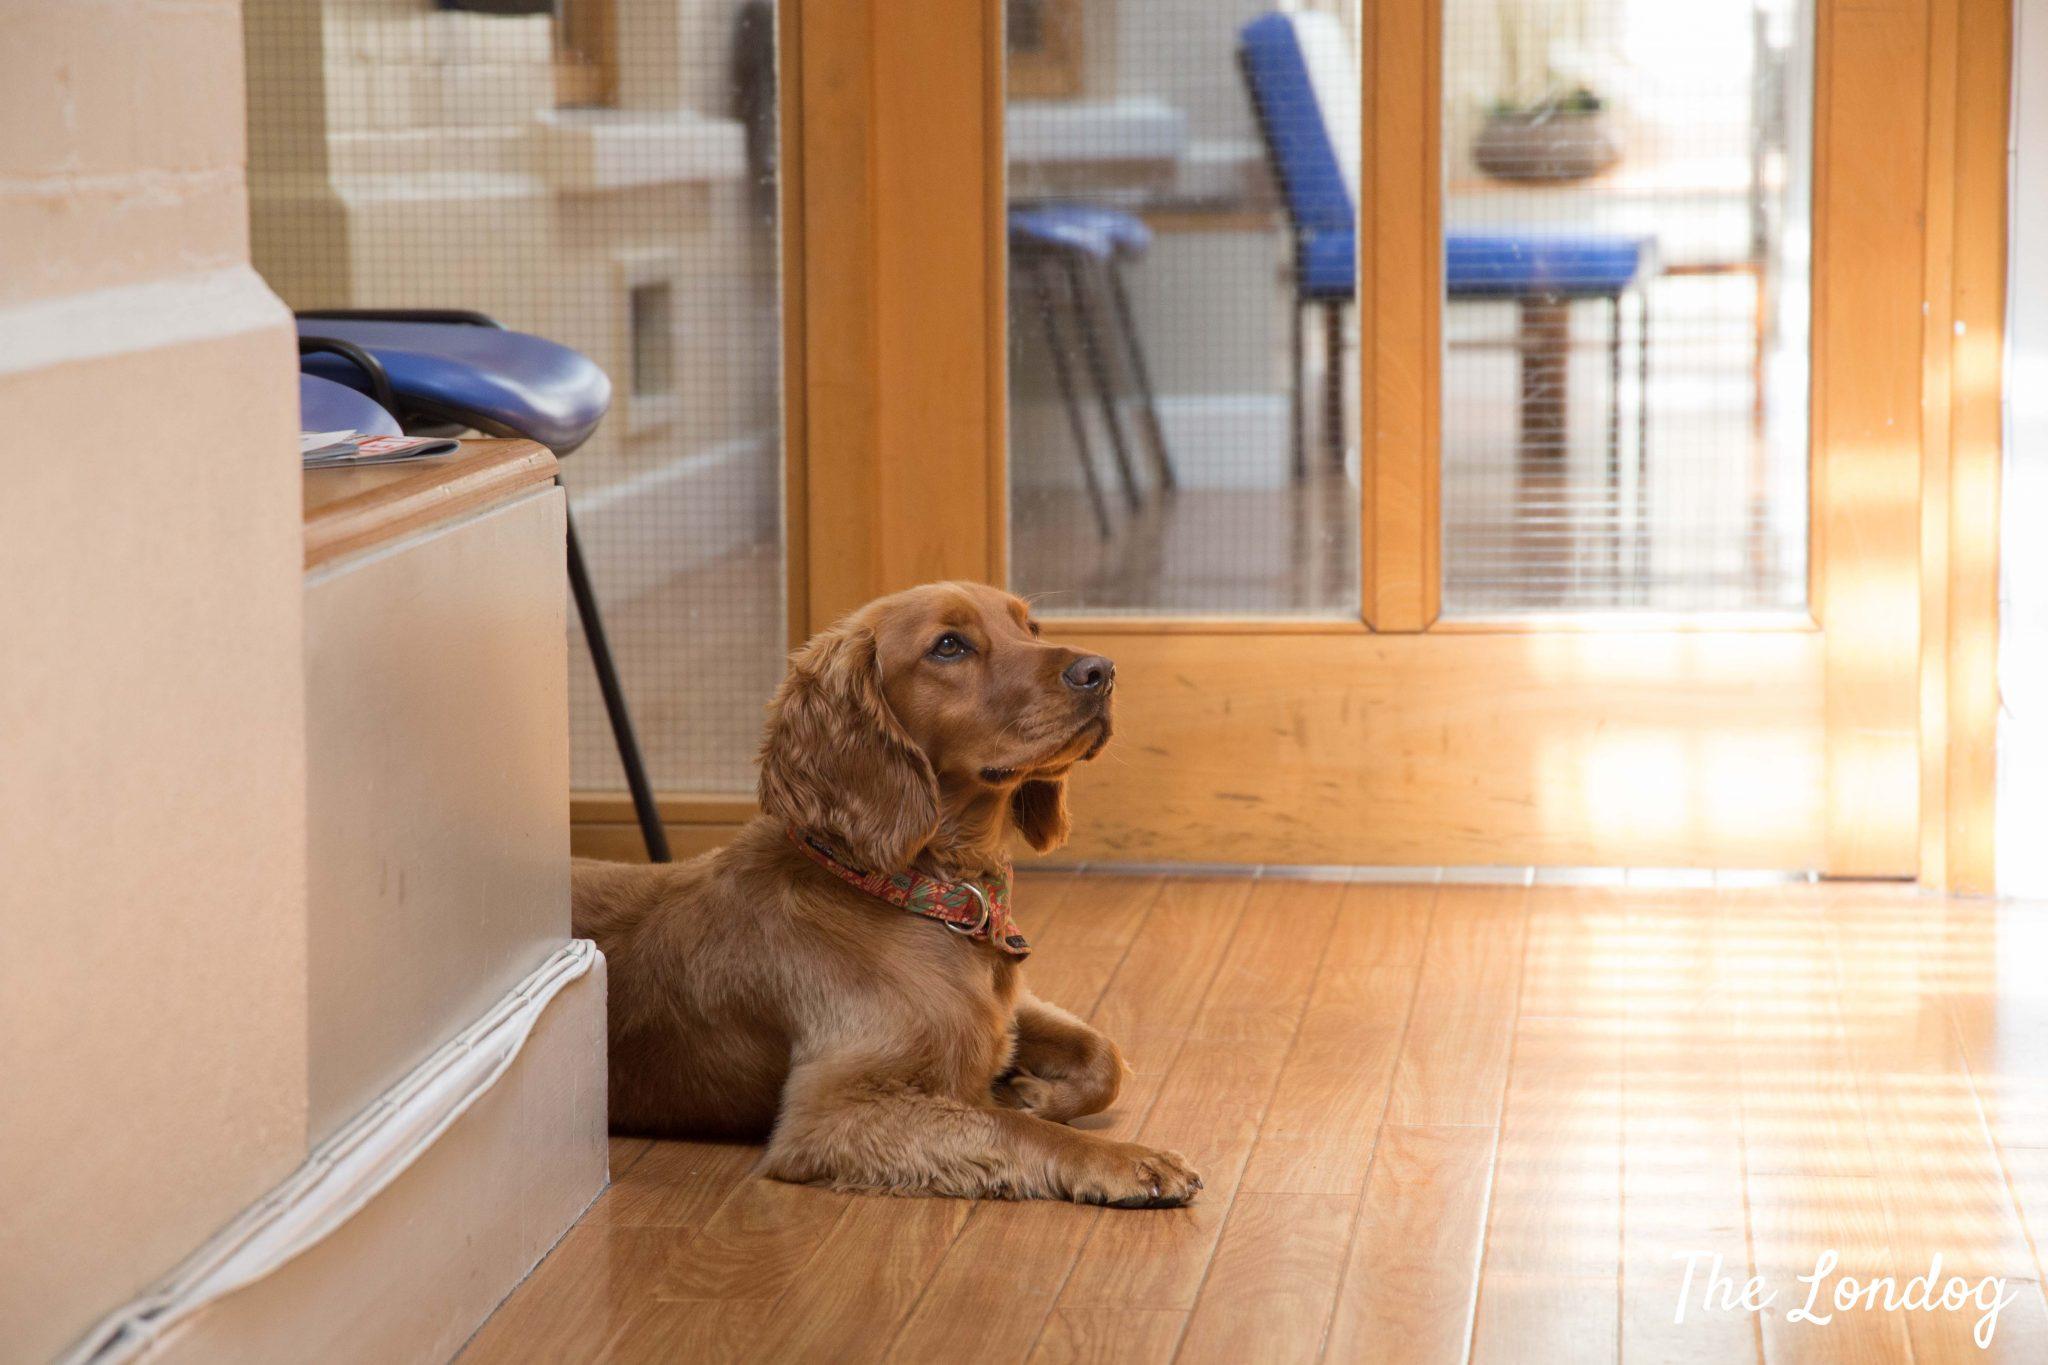 Gp dog lies on the floor